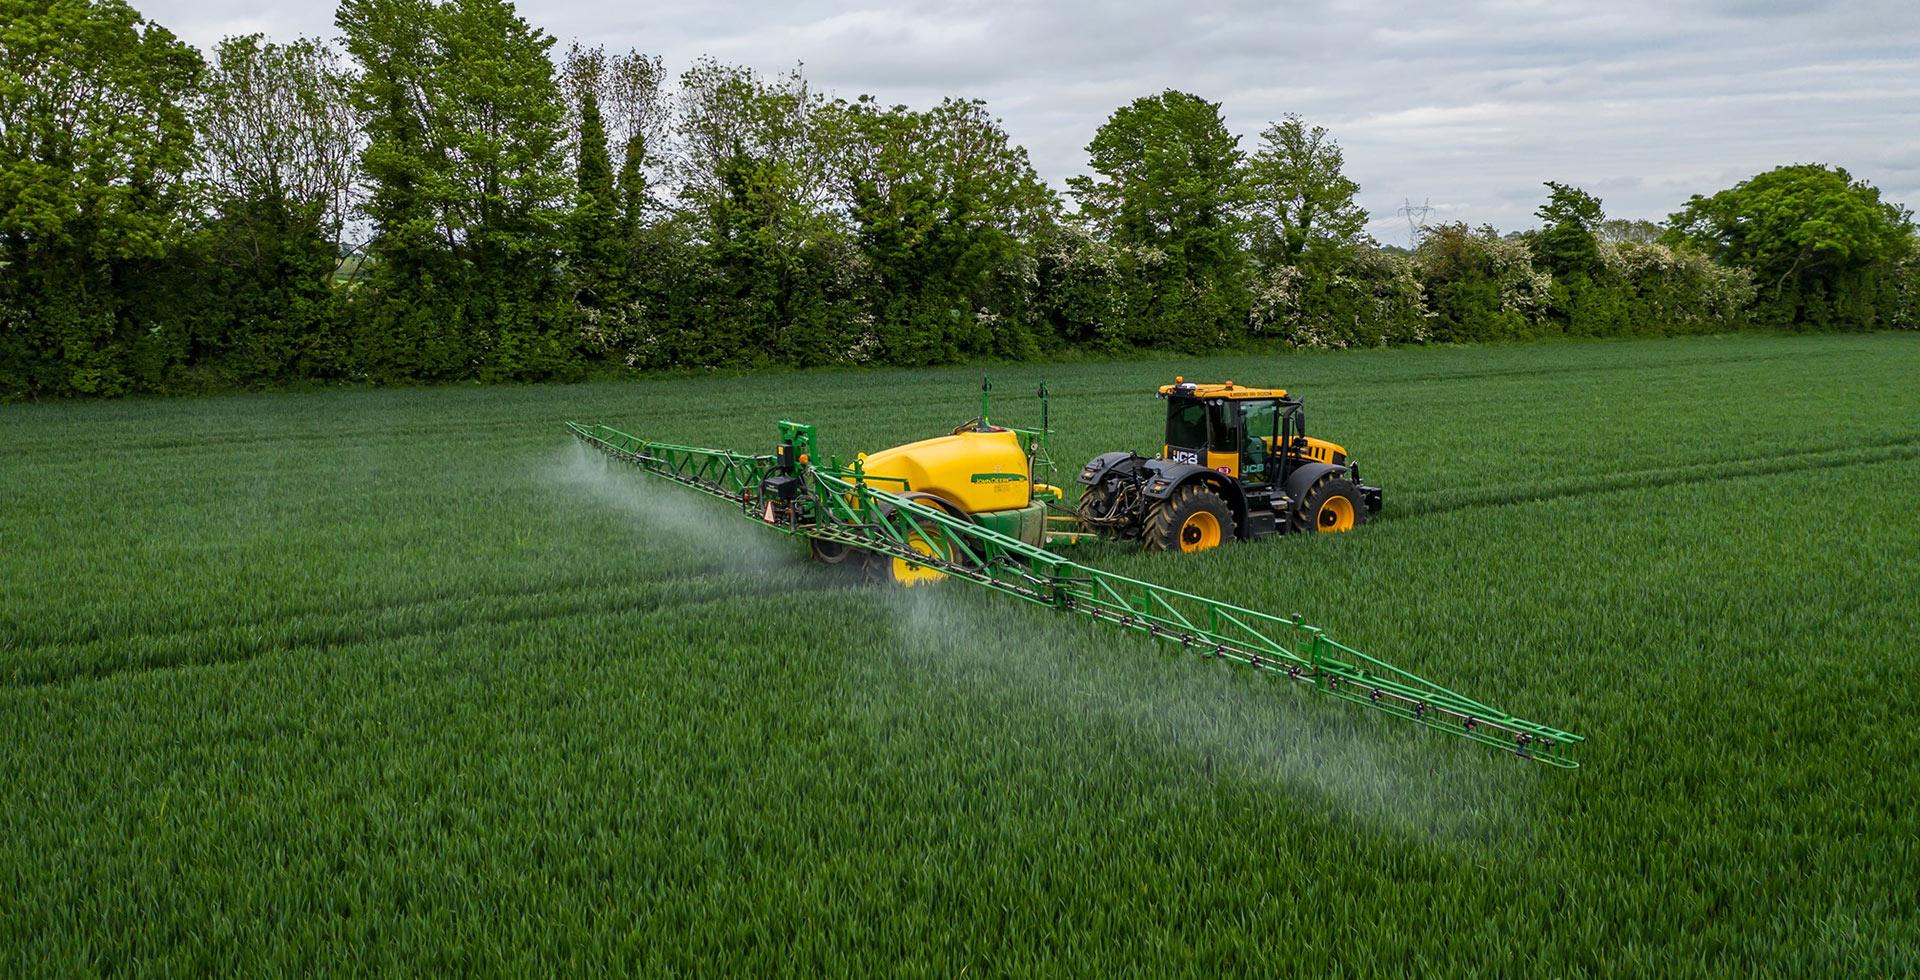 Vantage Ireland Trimble Agriculture resellers